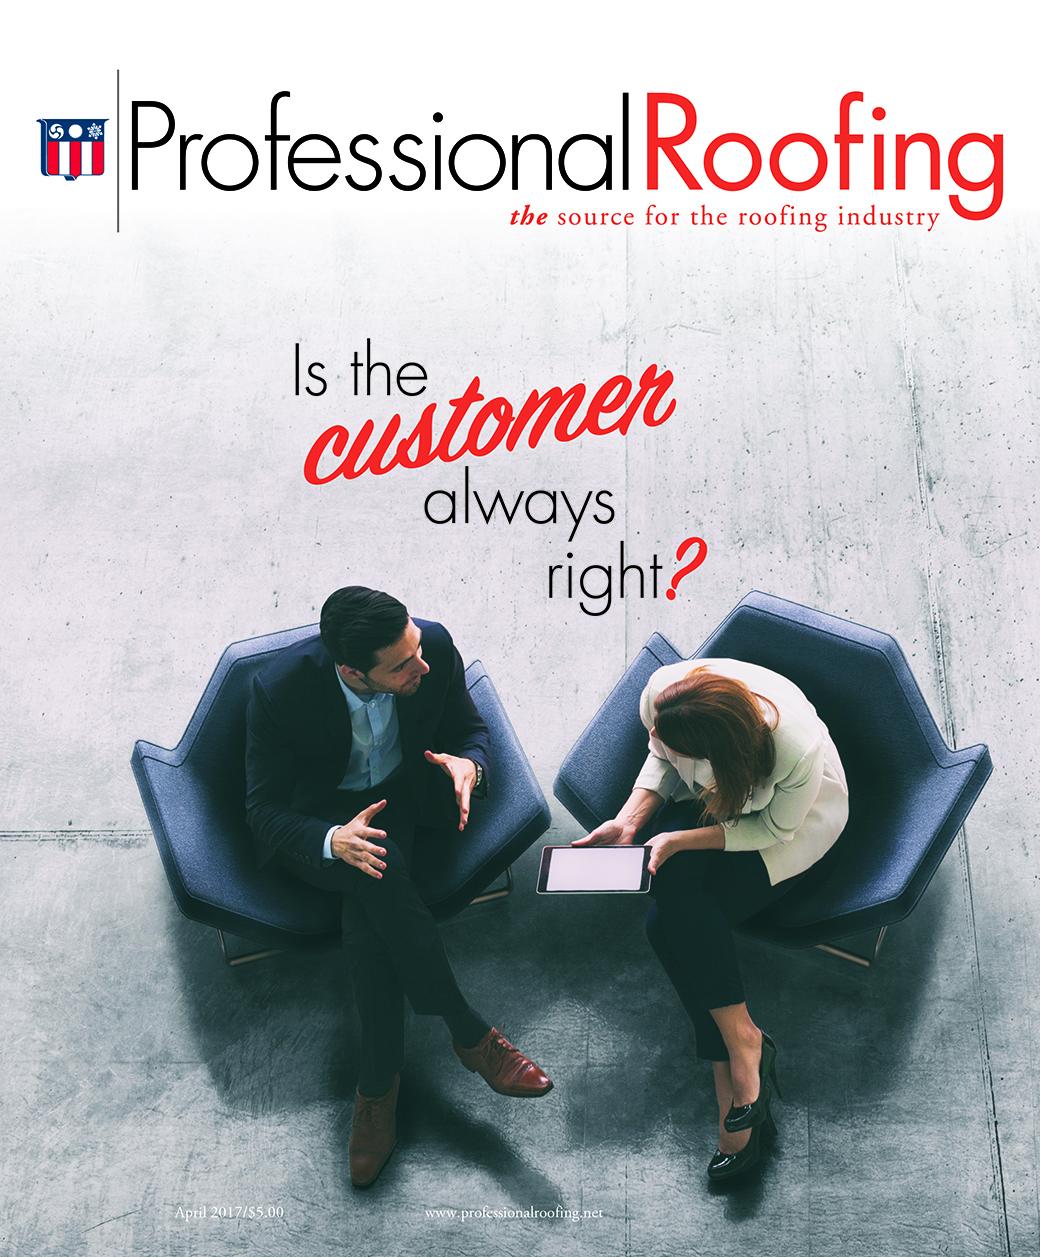 Professional Roofing Magazine 4/1/2017